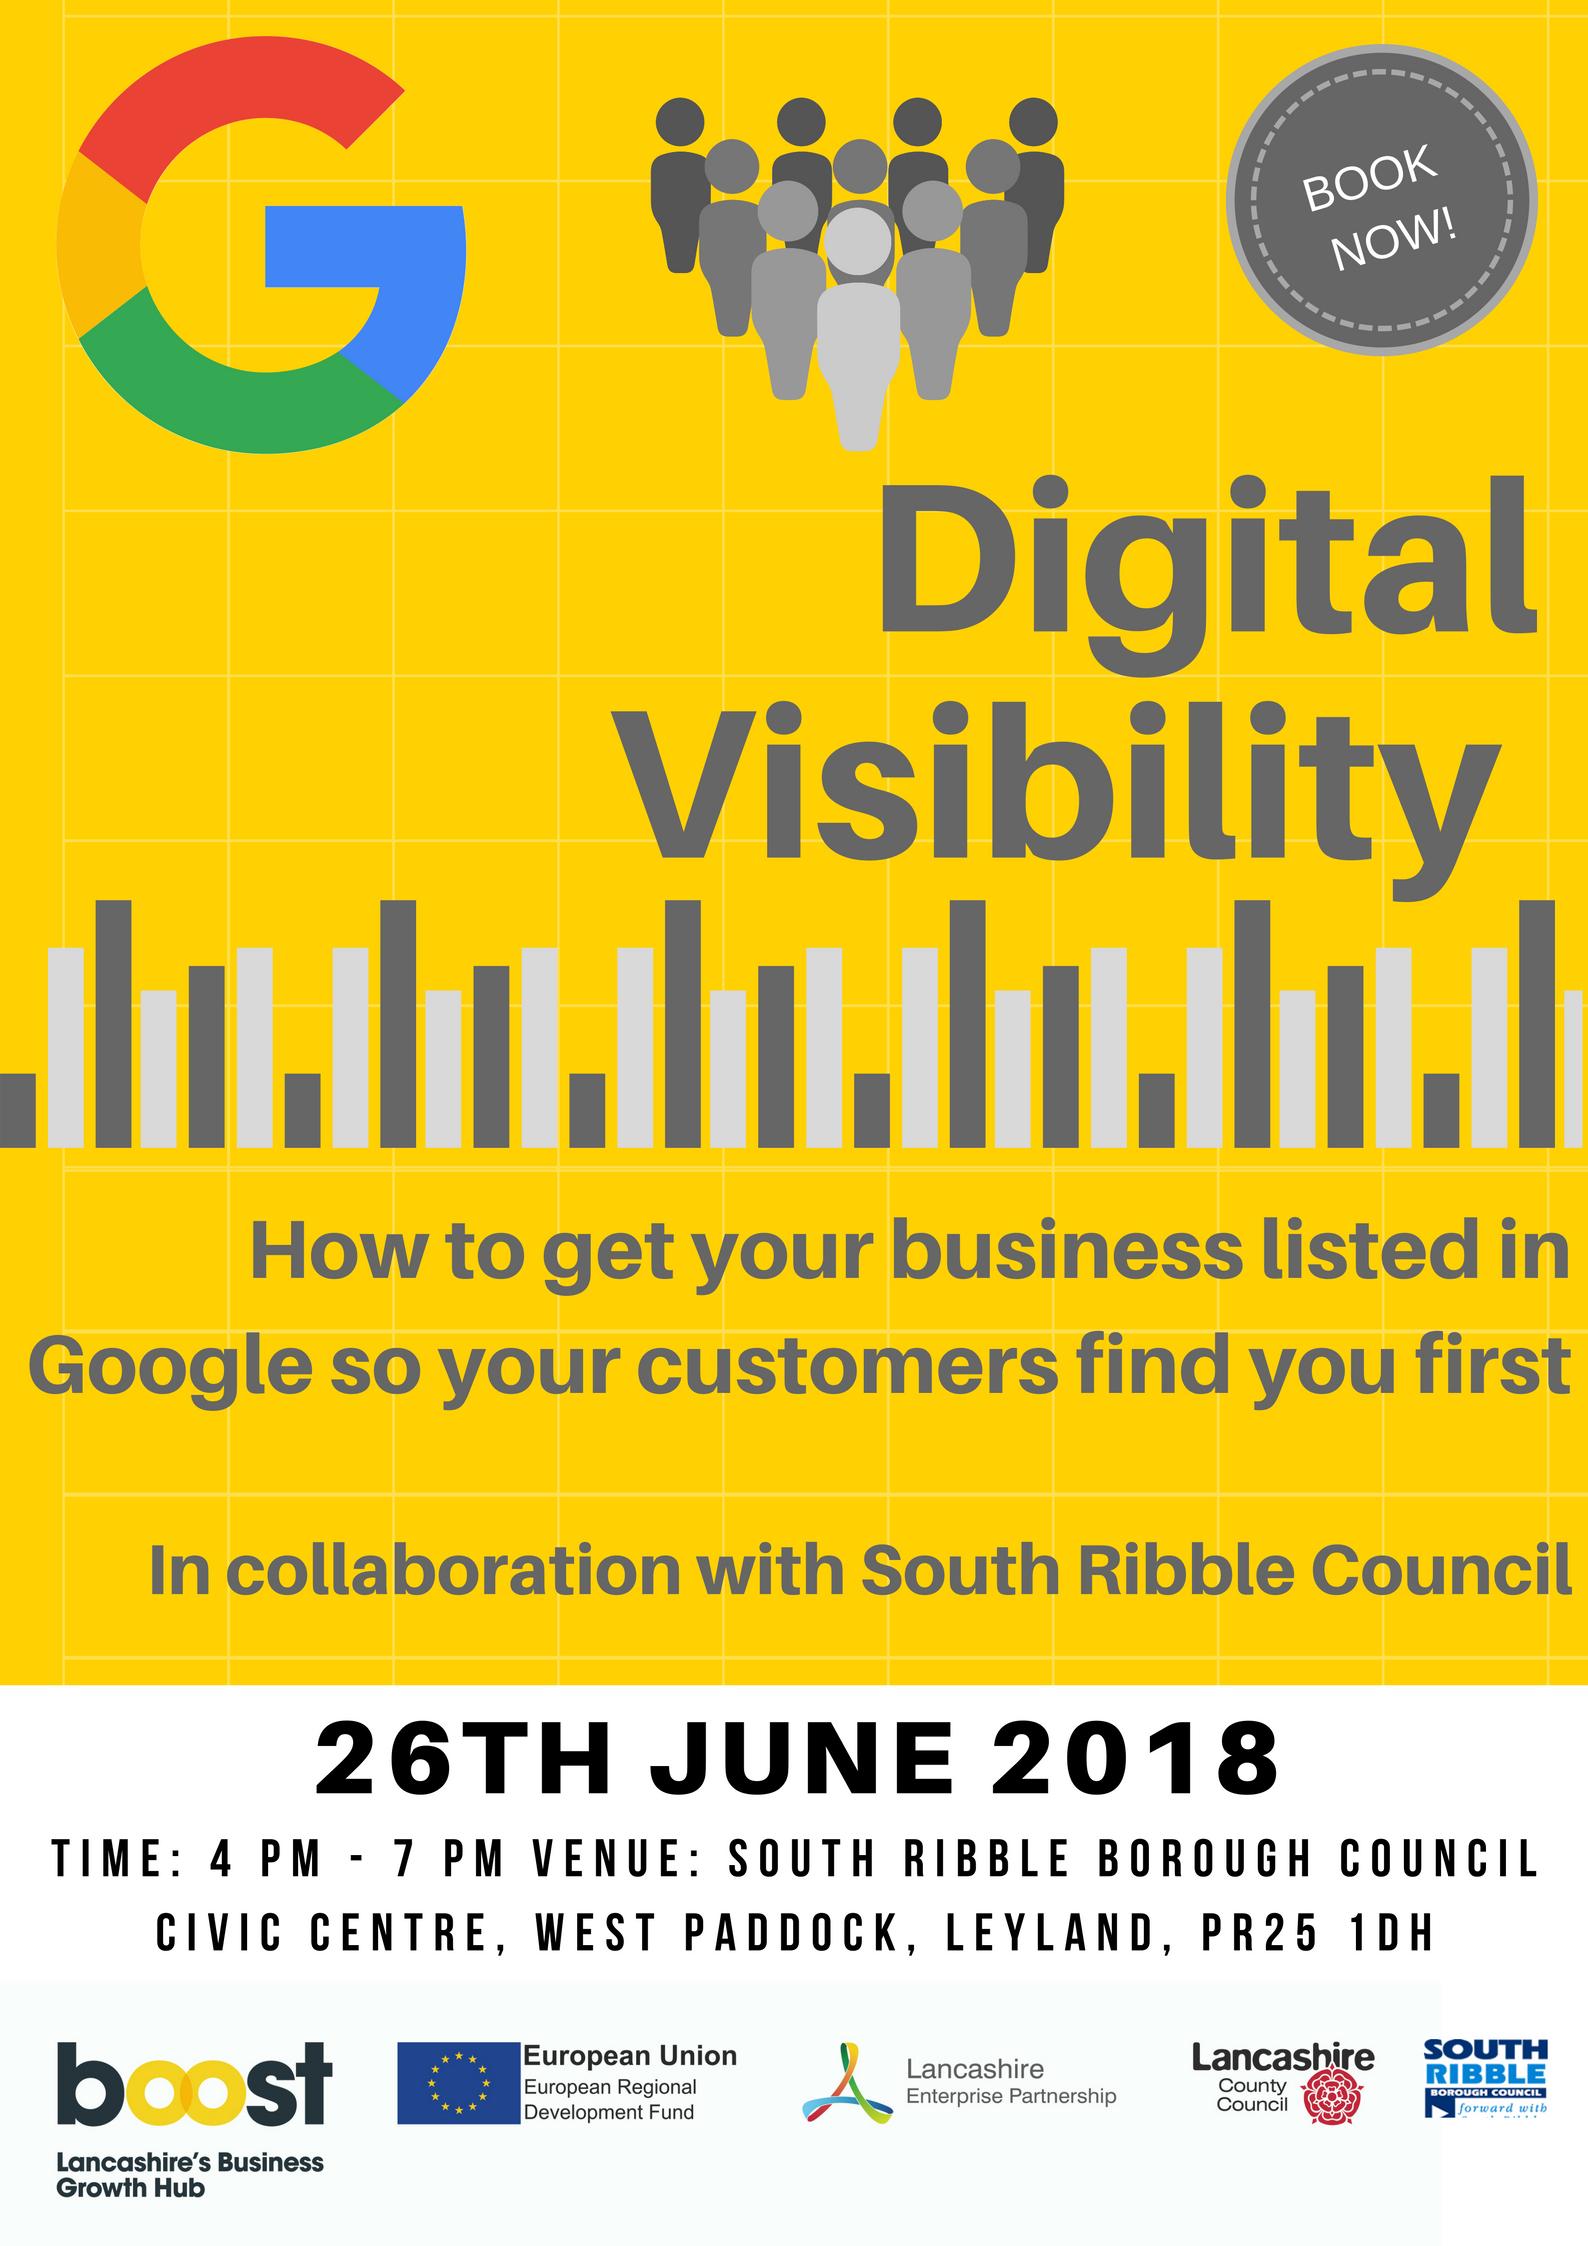 Digital Visibility Masterclass 26th June